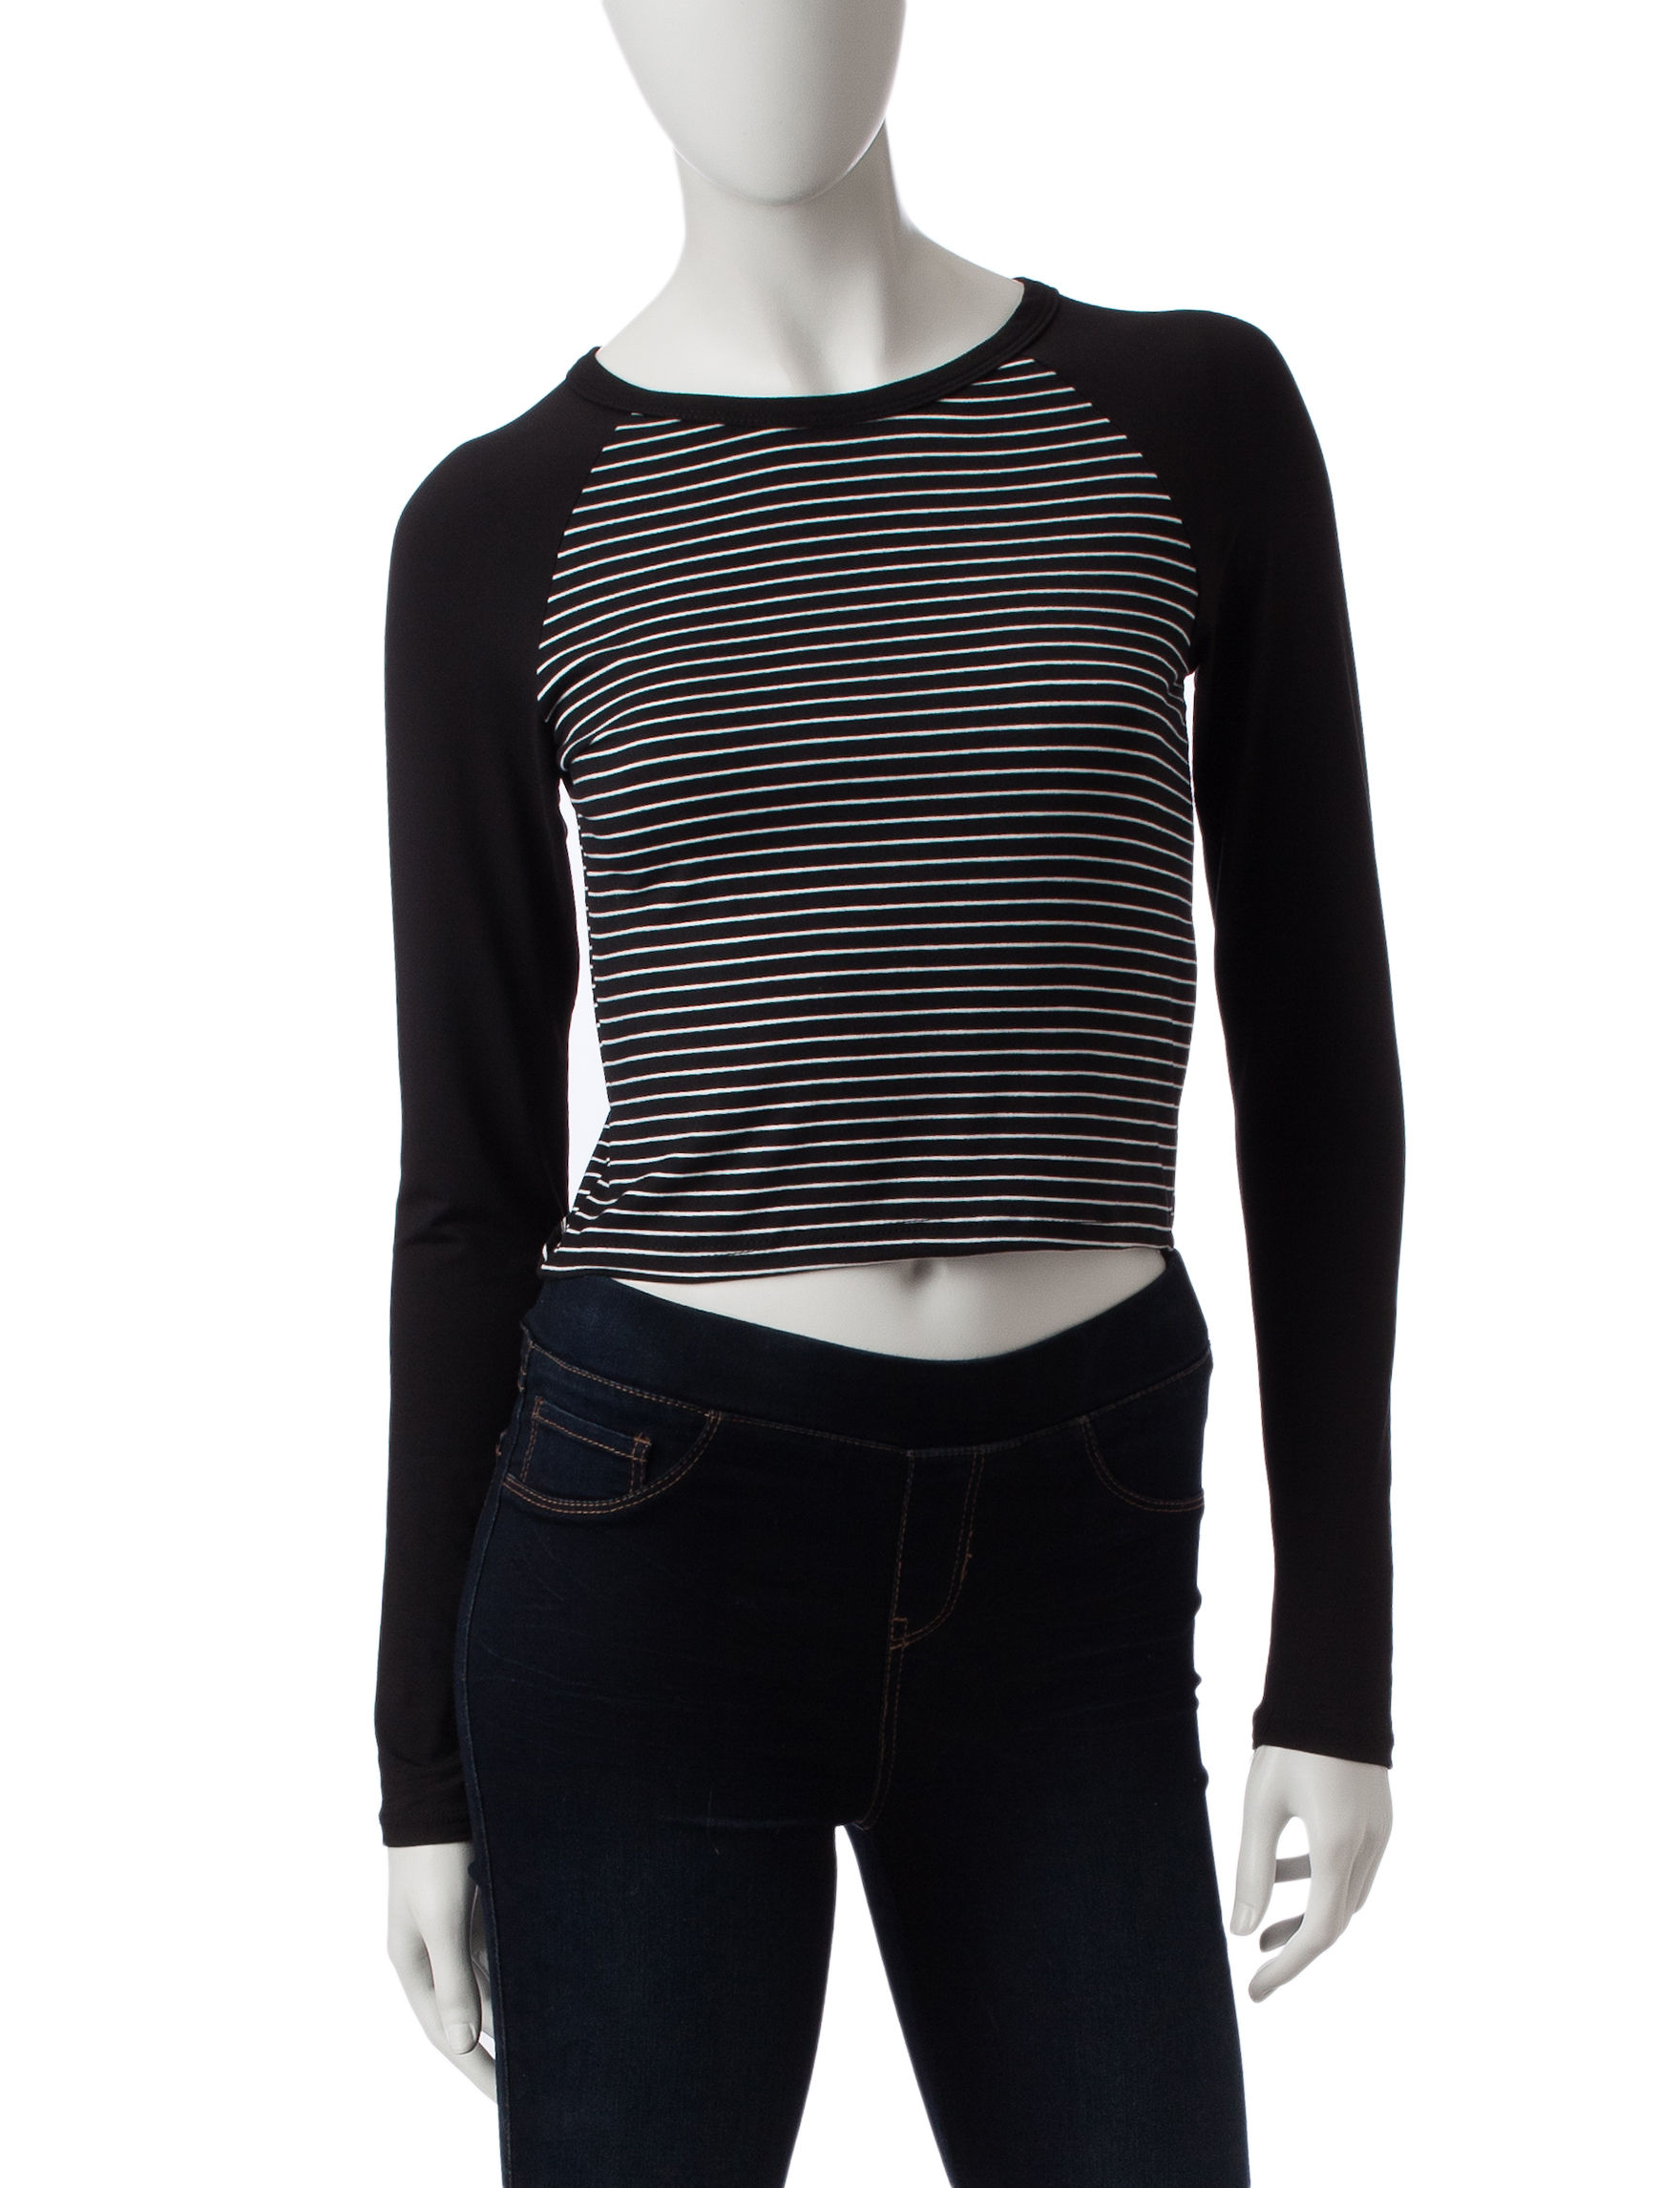 Wishful Park Black / White Shirts & Blouses